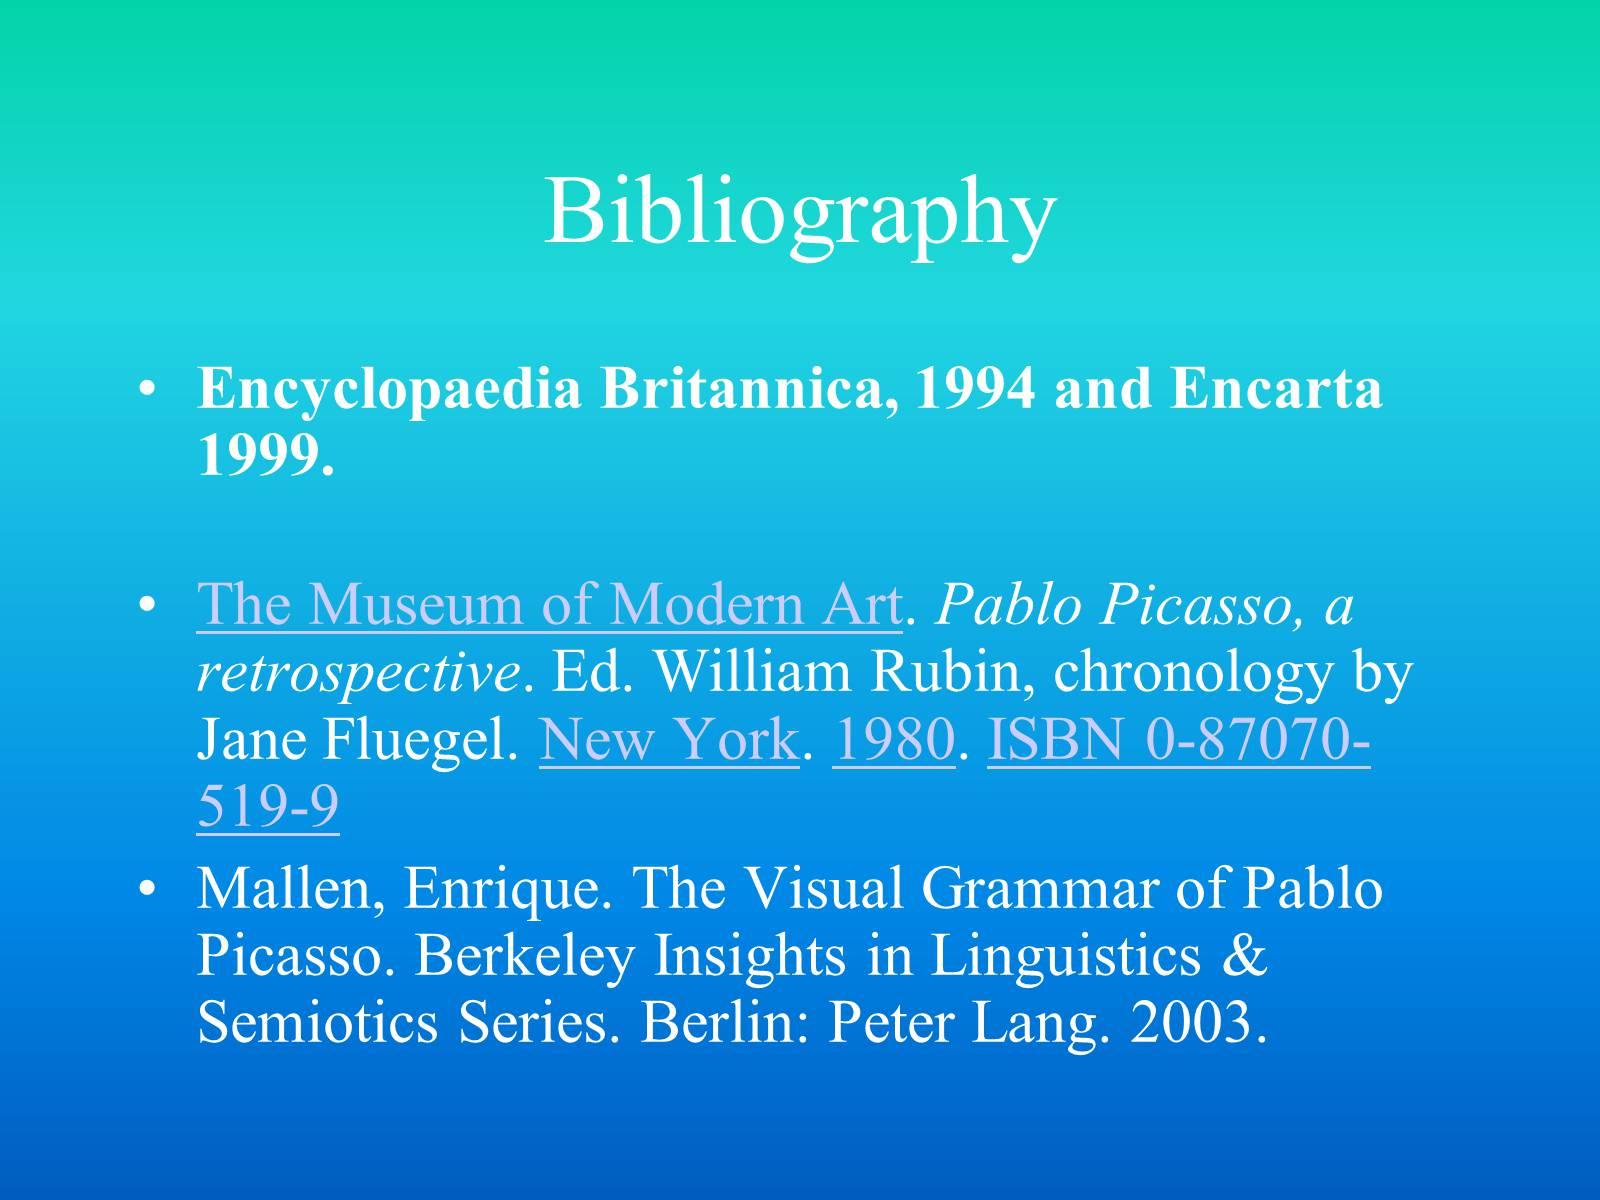 bibliography of encyclopedia